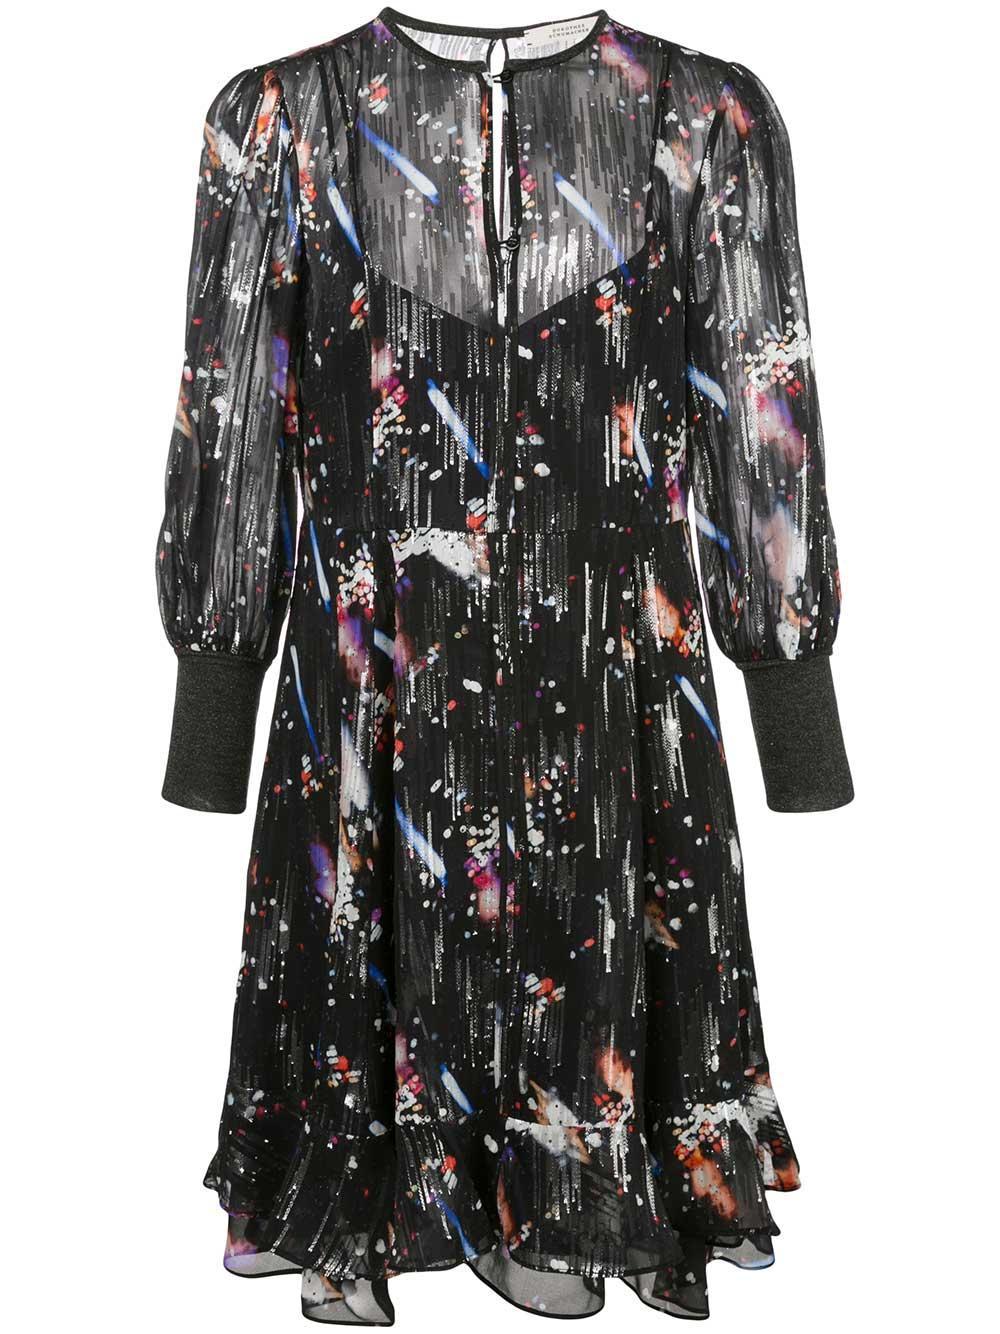 Tokyo Lights Metallic Dress